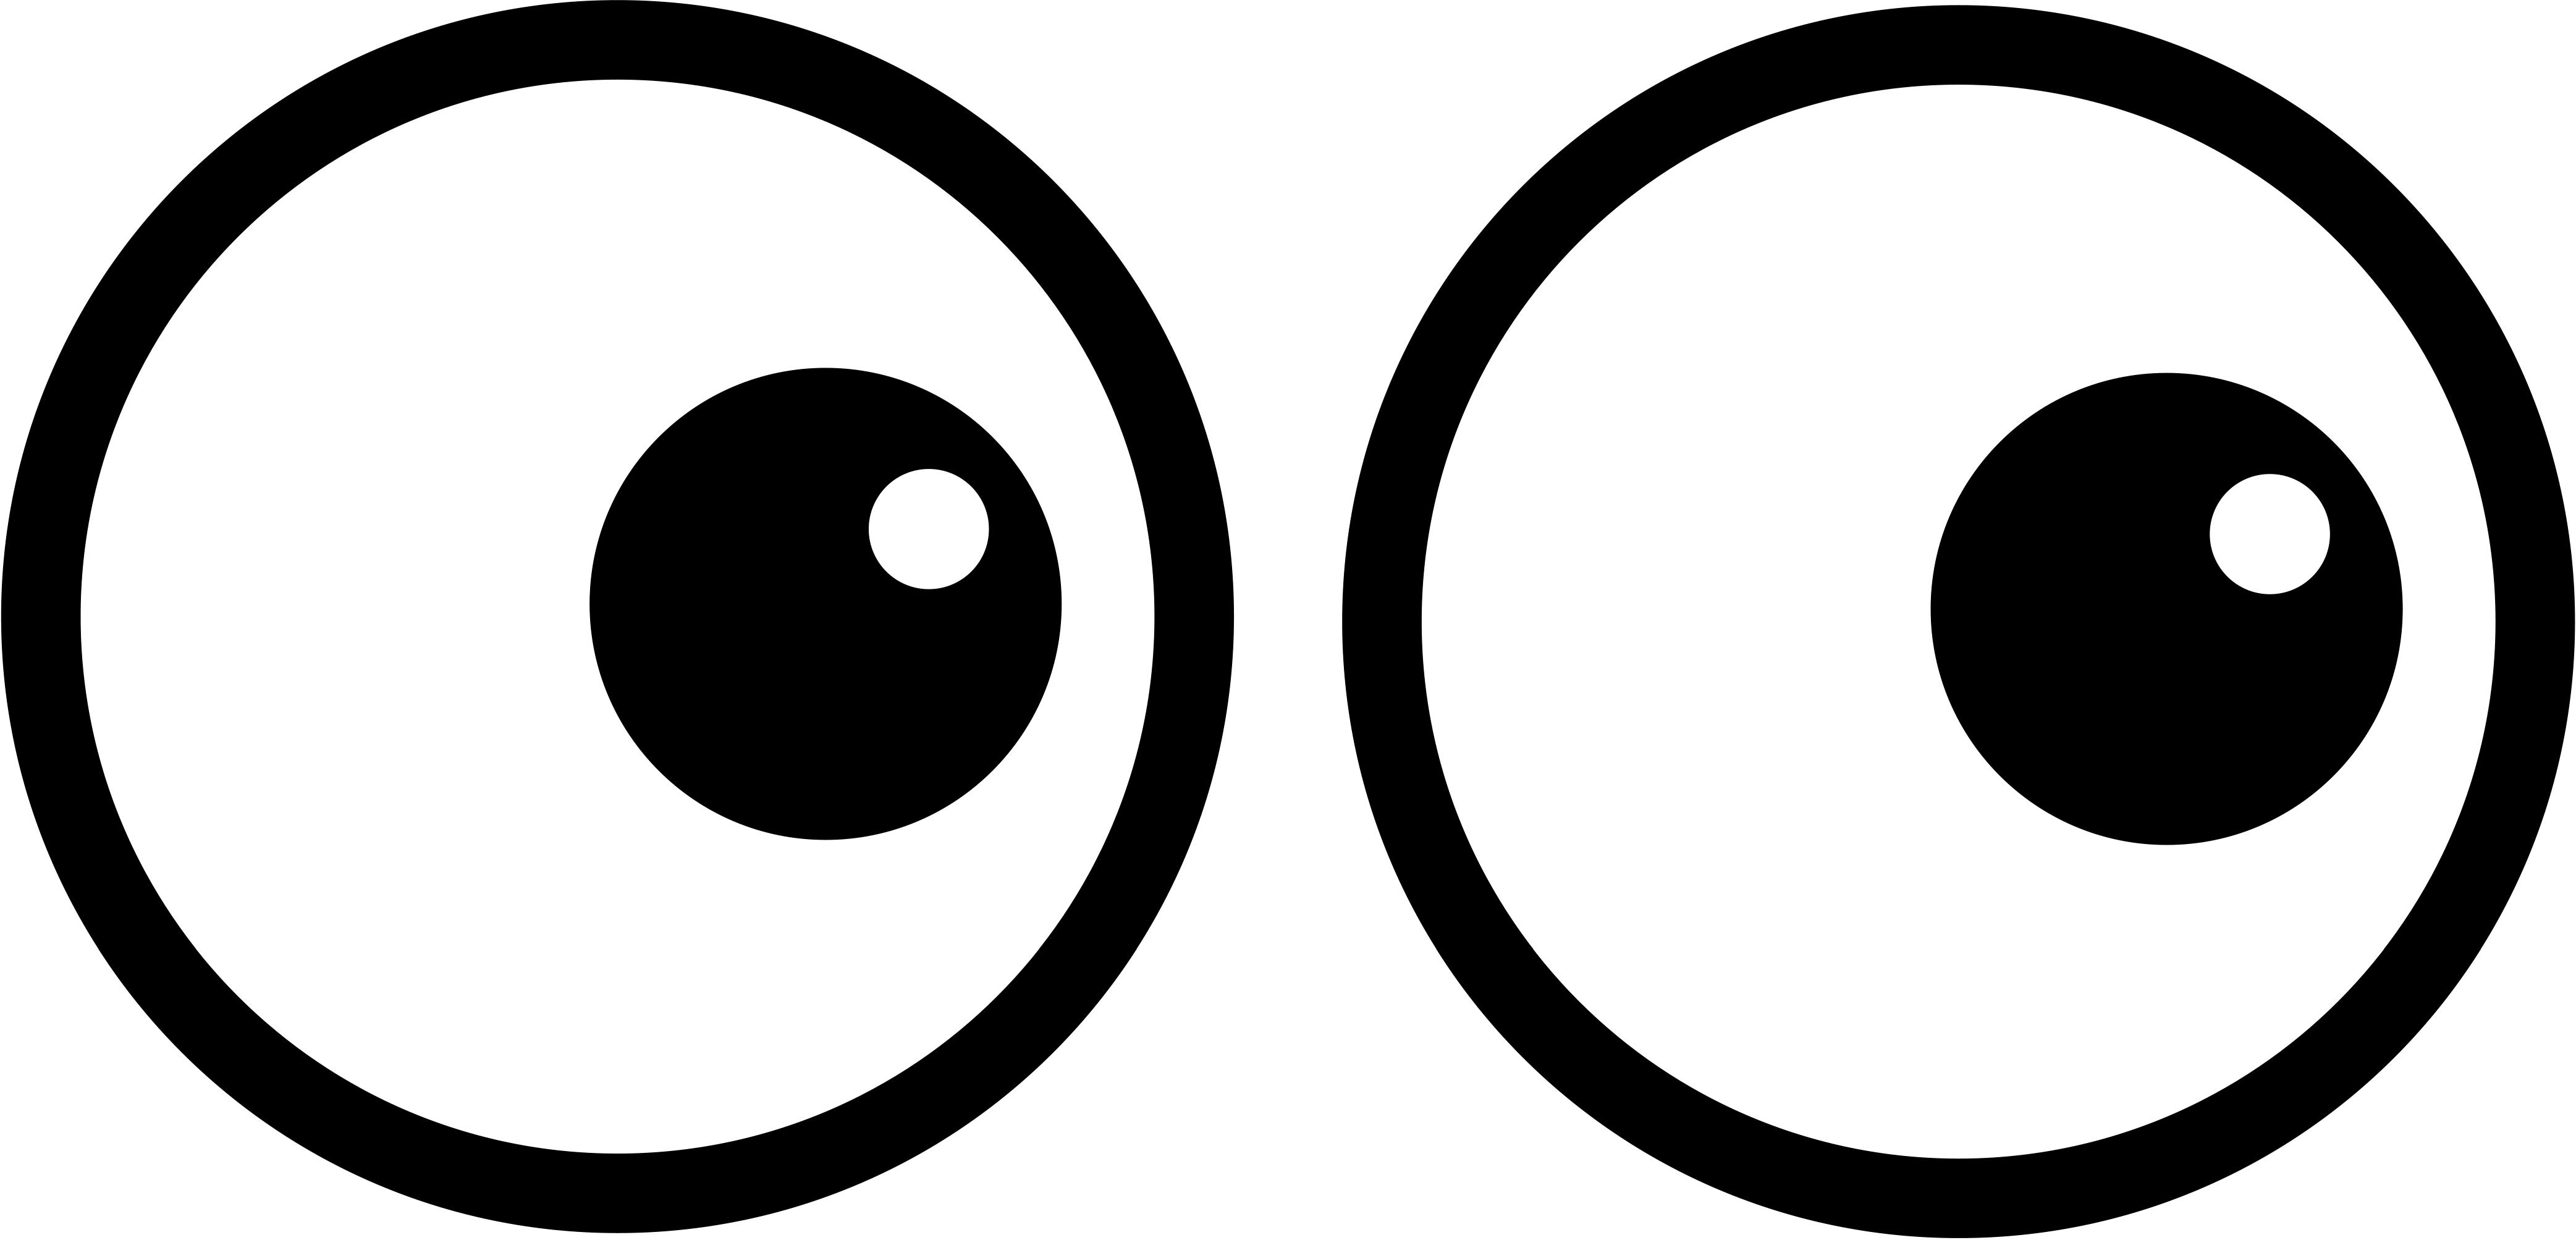 Eyeball clipart eye ball. Free cliparts download clip